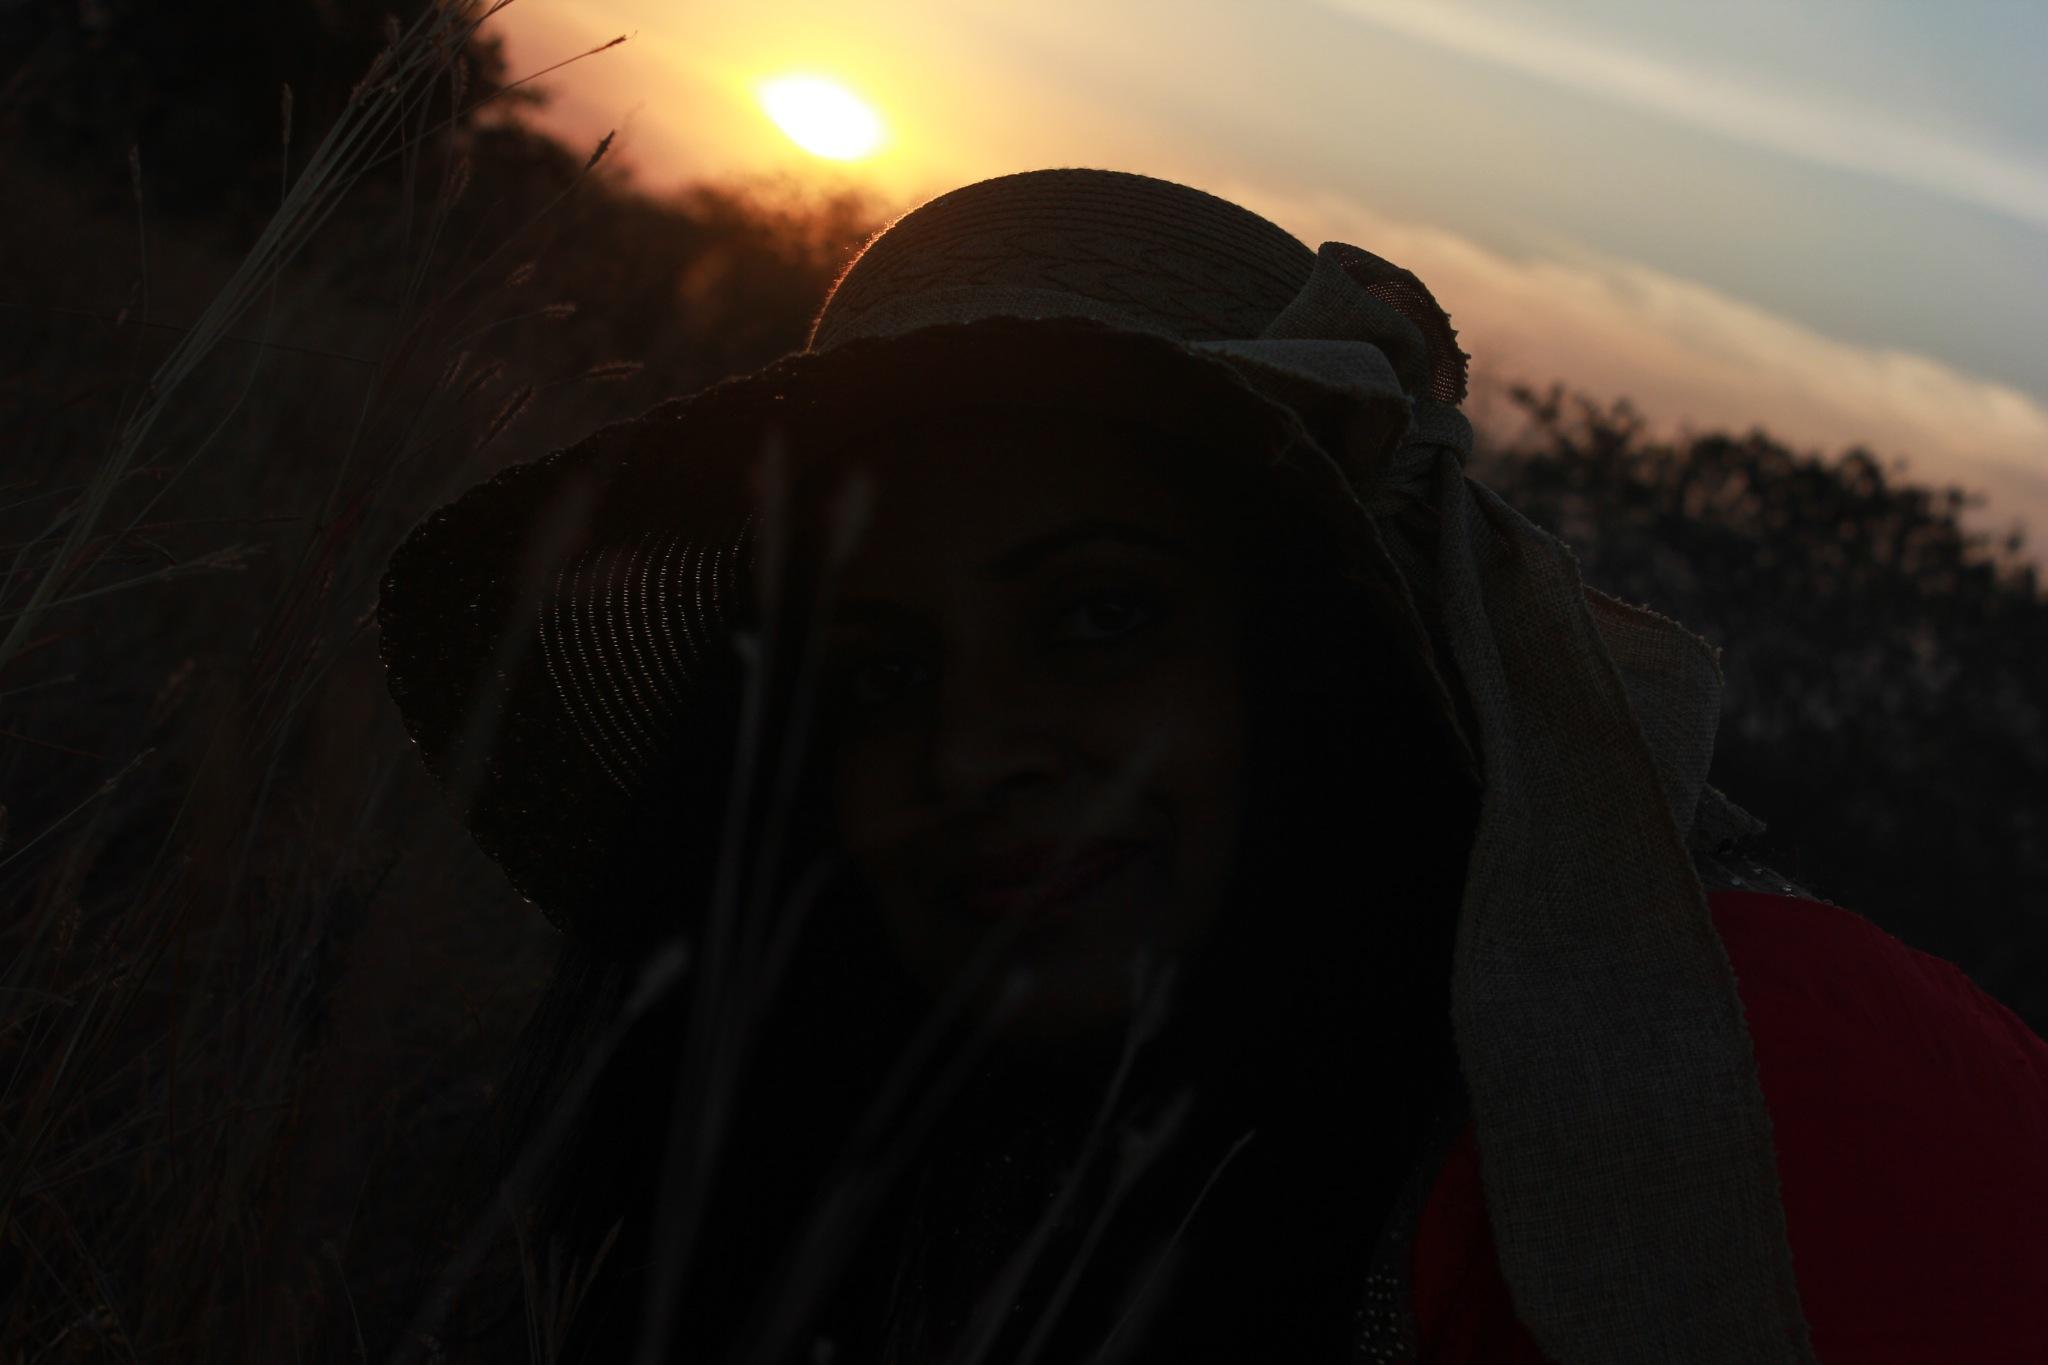 Beauty at dusk!! by Surekha Pillai